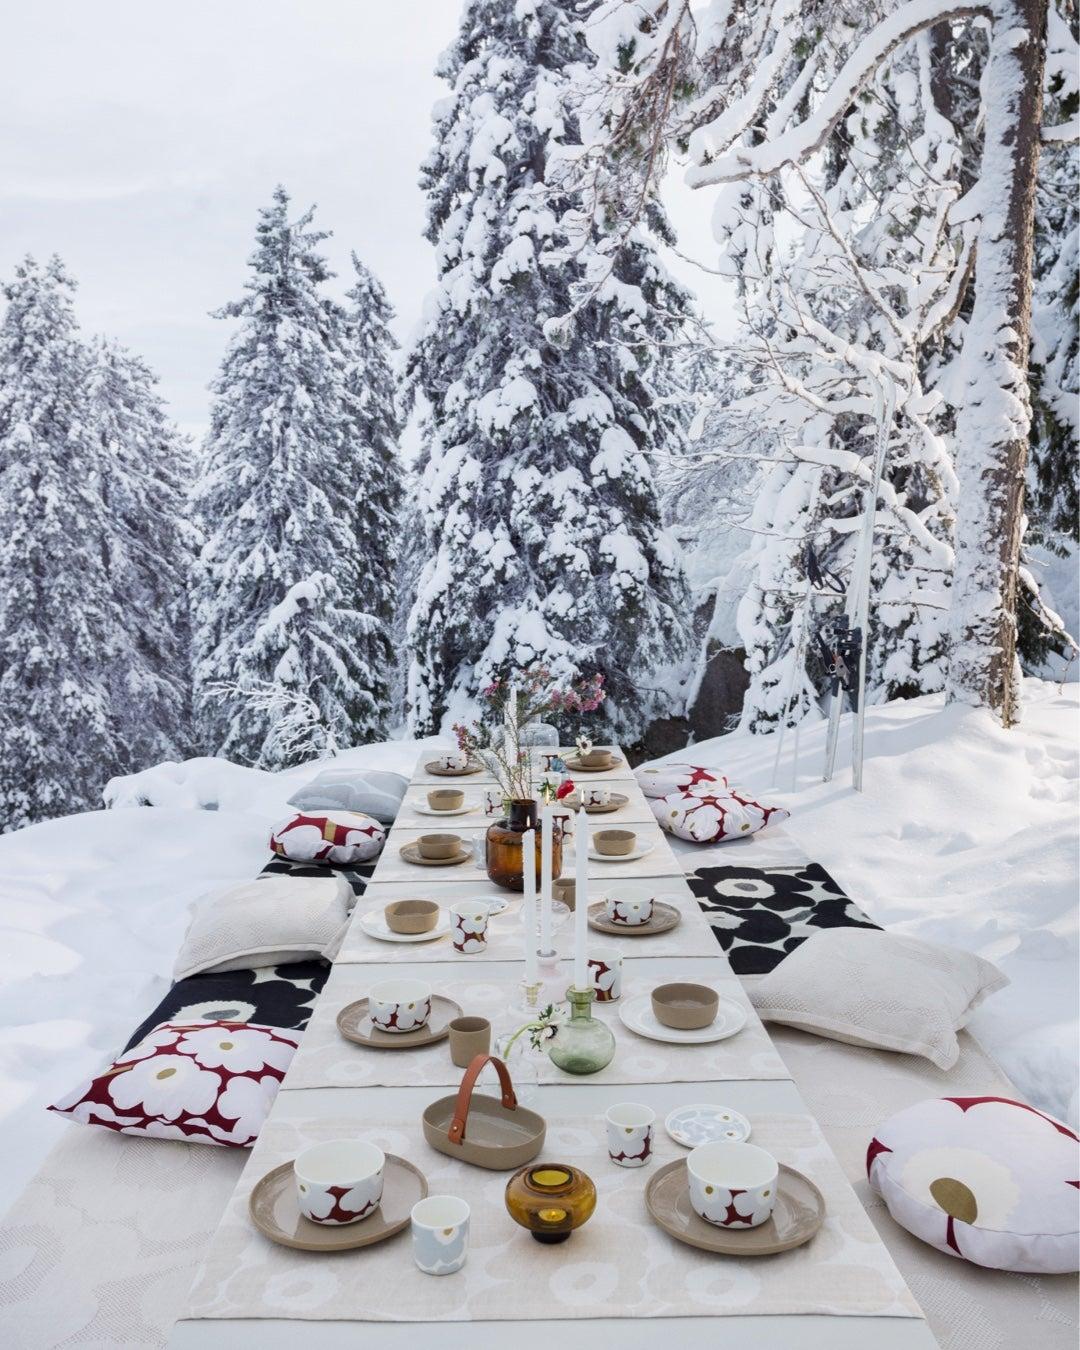 Marimekko Holiday Gift guide